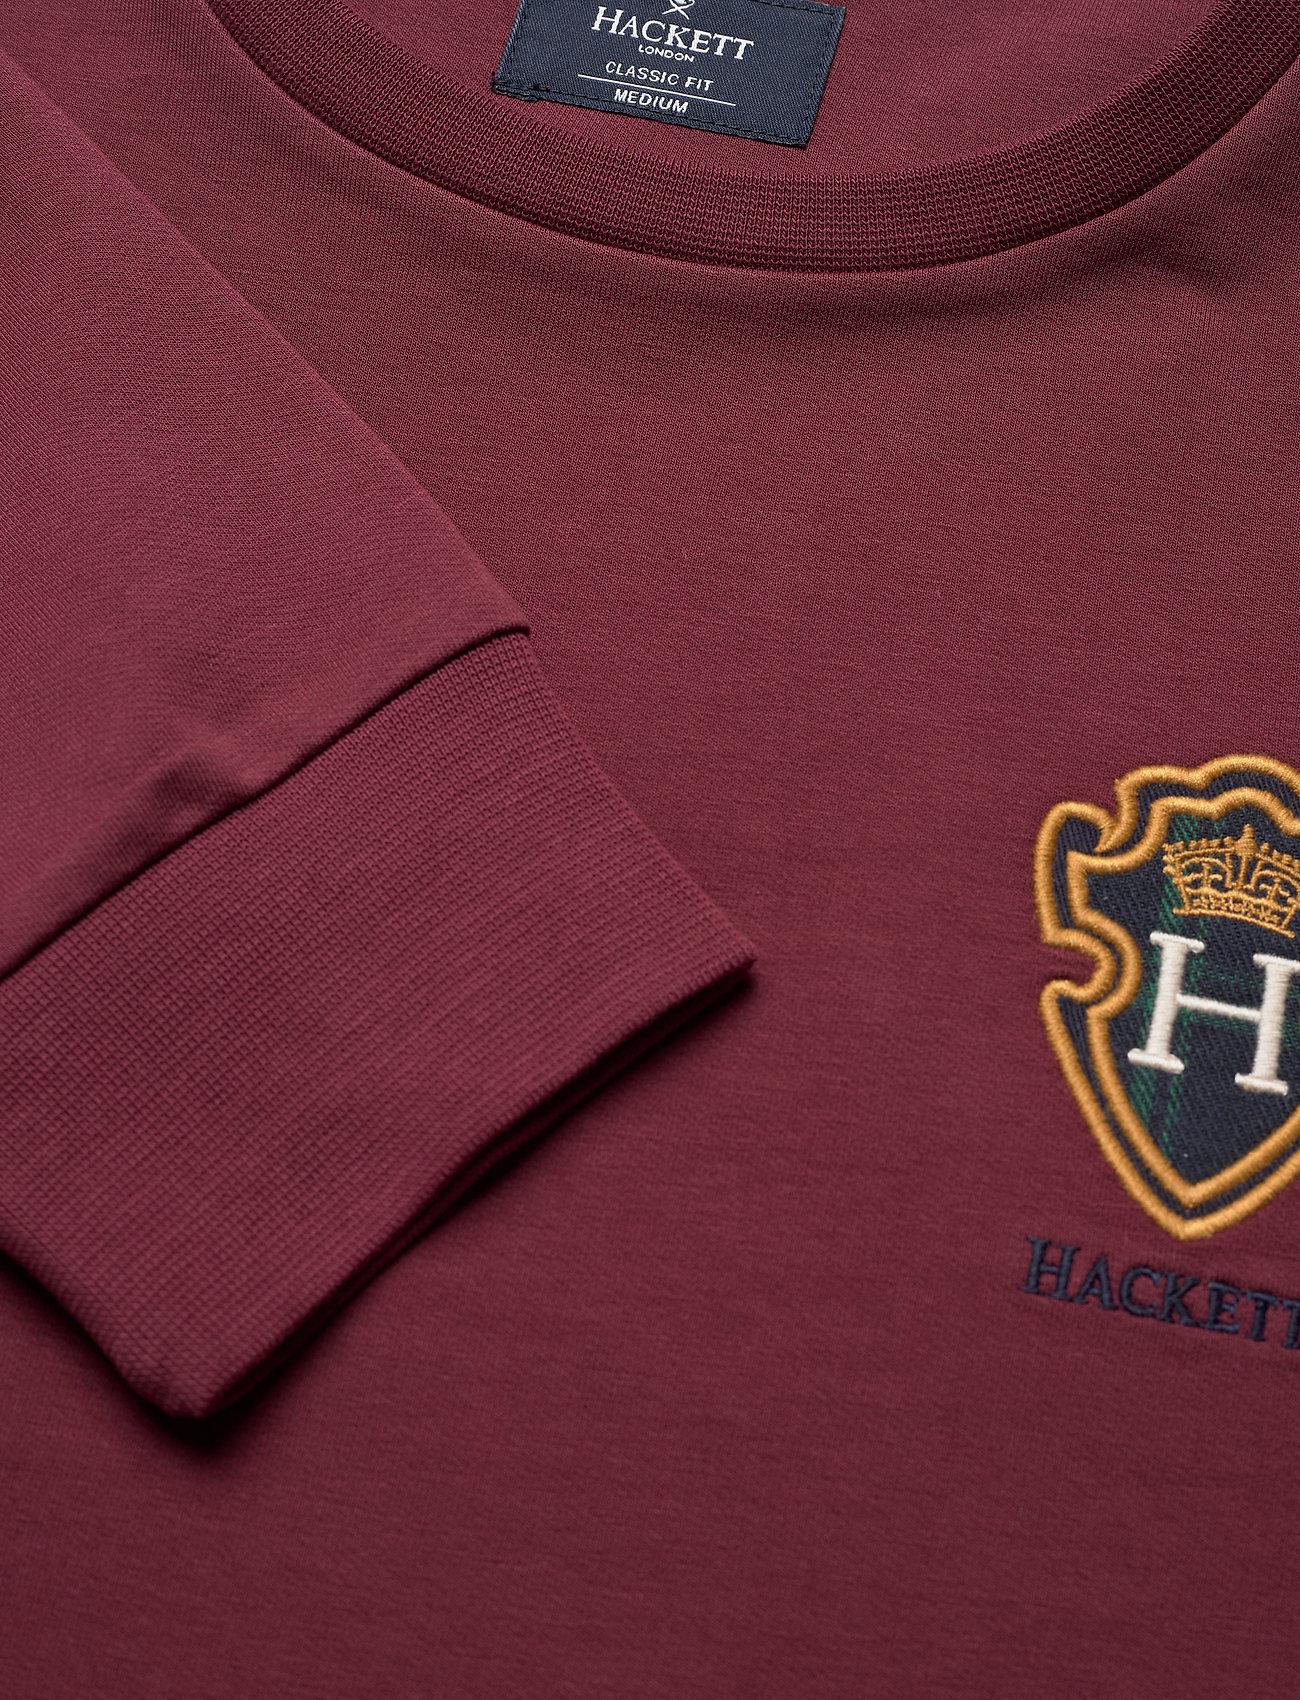 Hackett London BLACKWATCH CREW - Sweatshirts OXBLOOD - Menn Klær